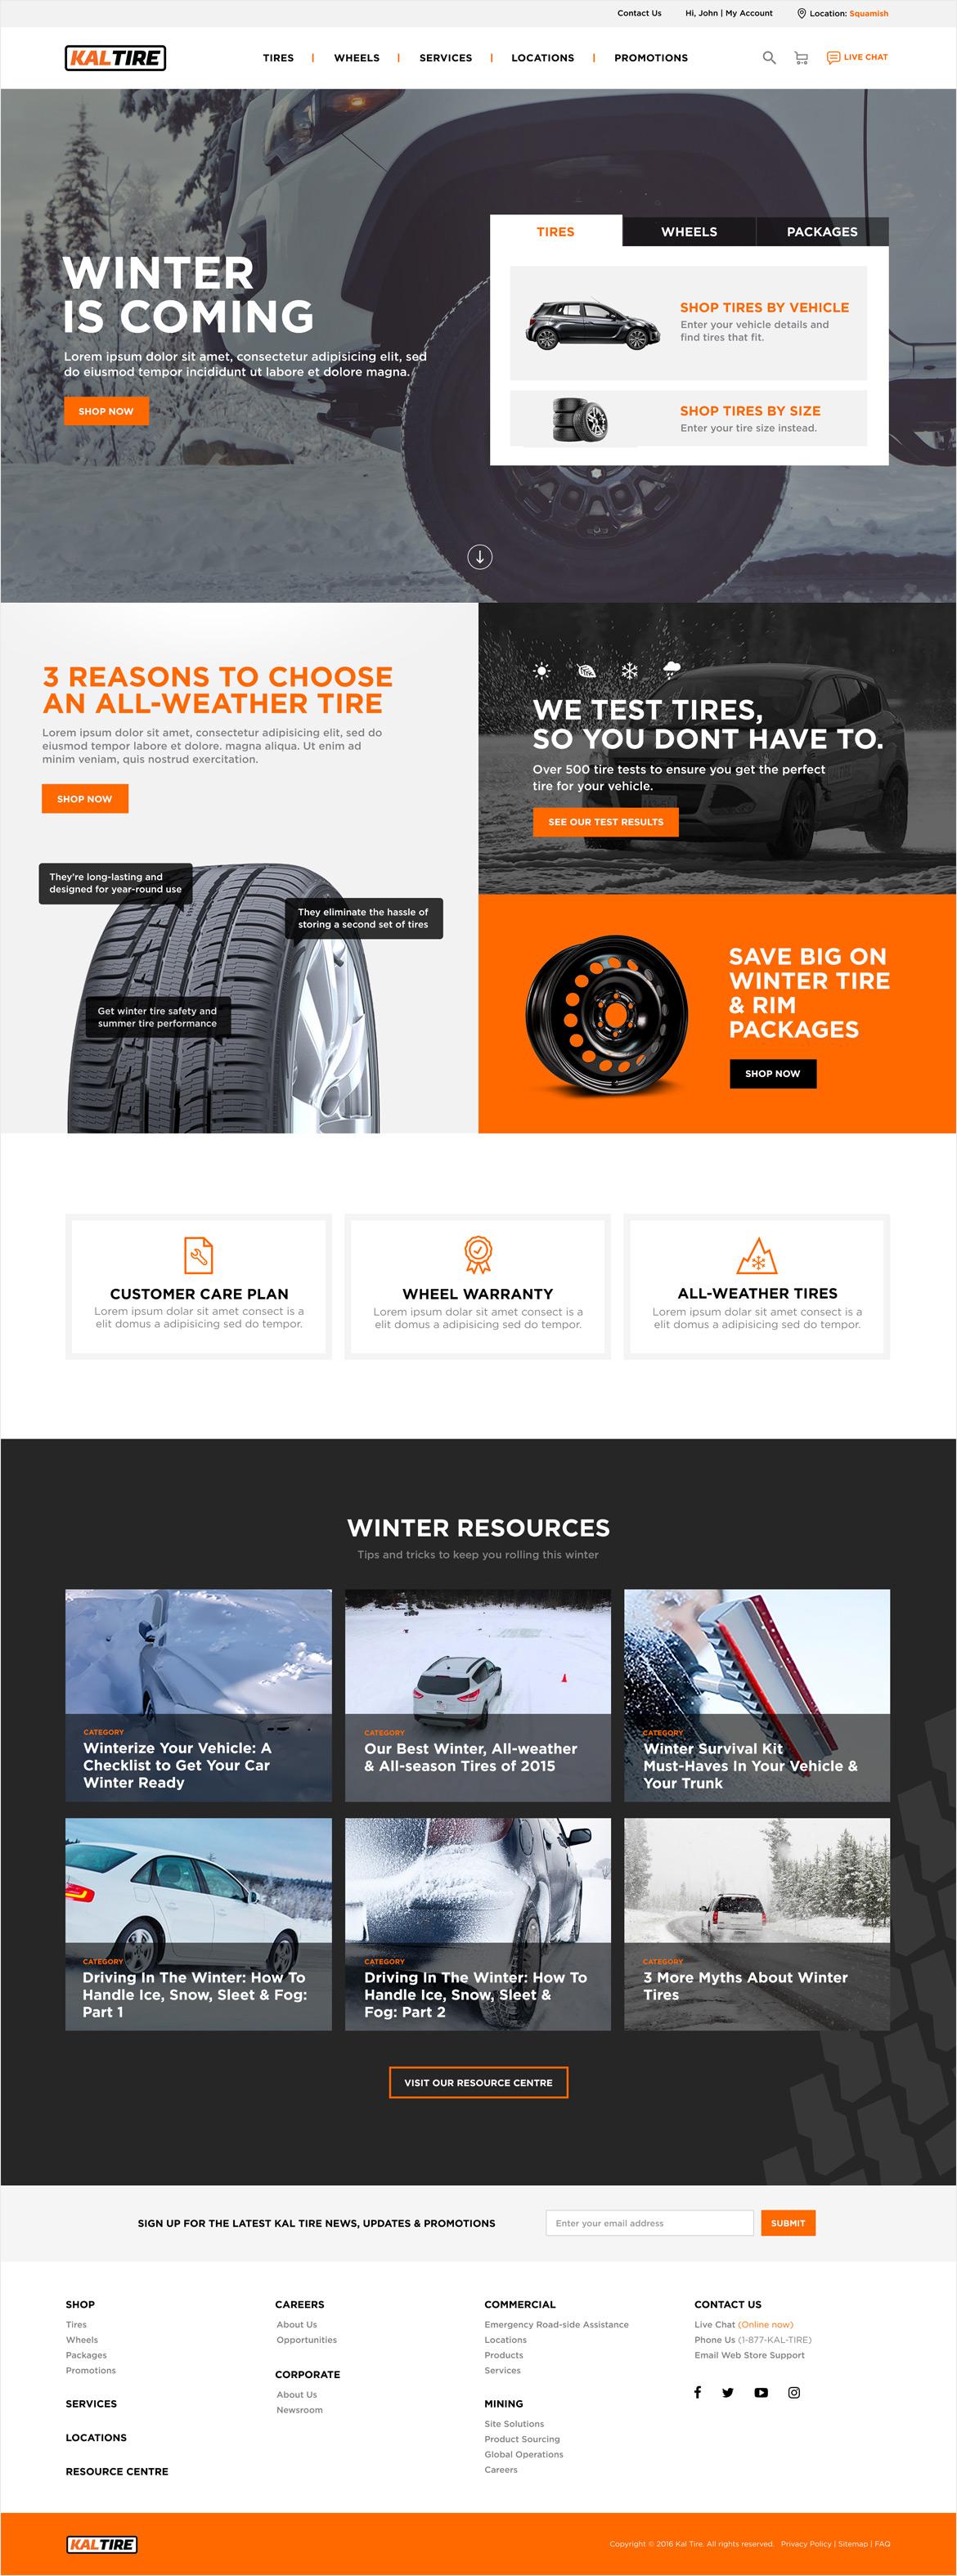 KalTire_homepage